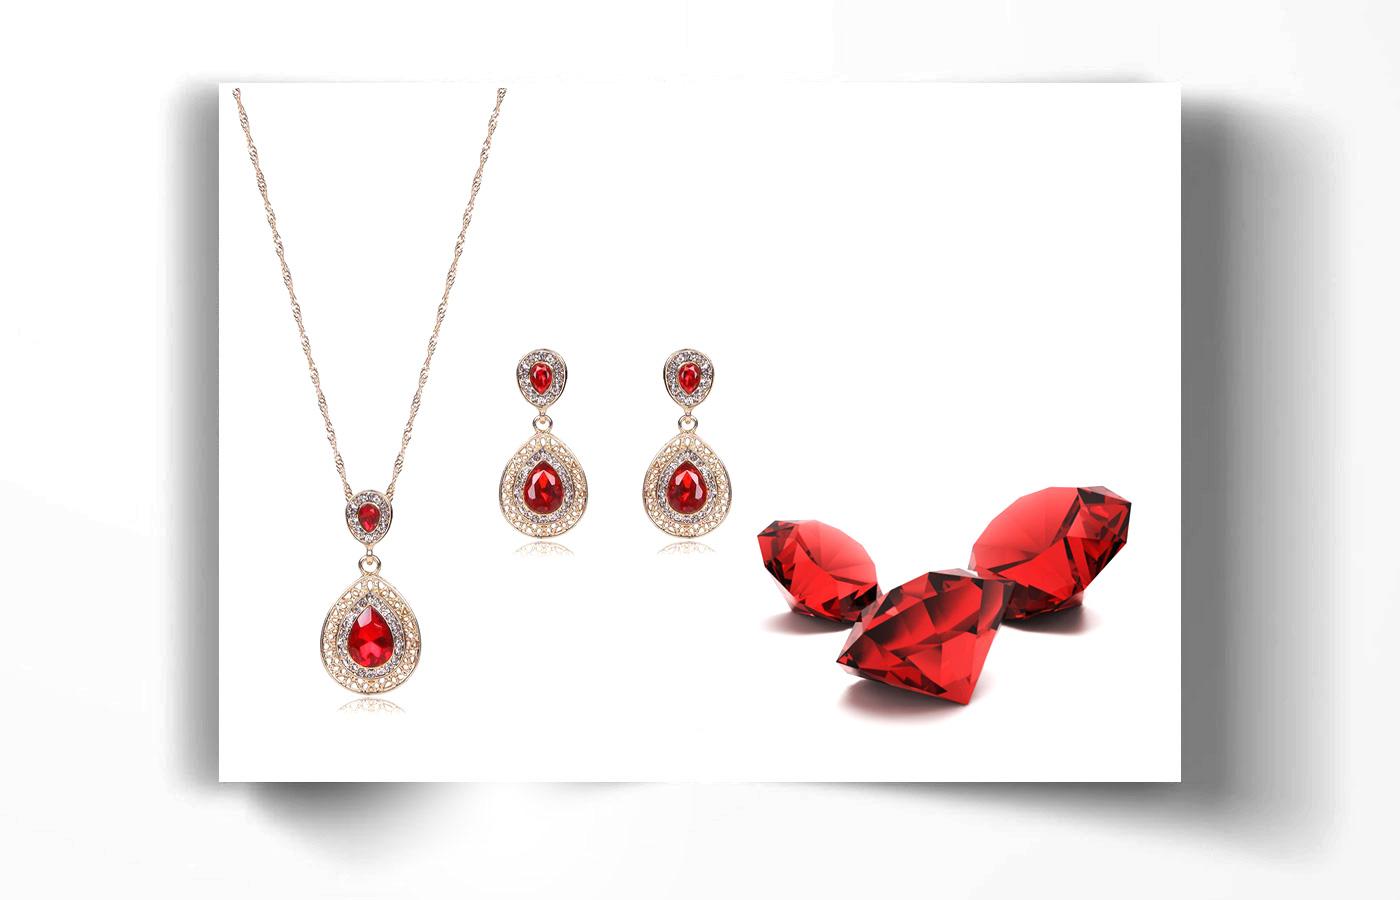 Ruby in Feng Shui 2a - رمز و رازهای یاقوت سرخ در فنگ شویی